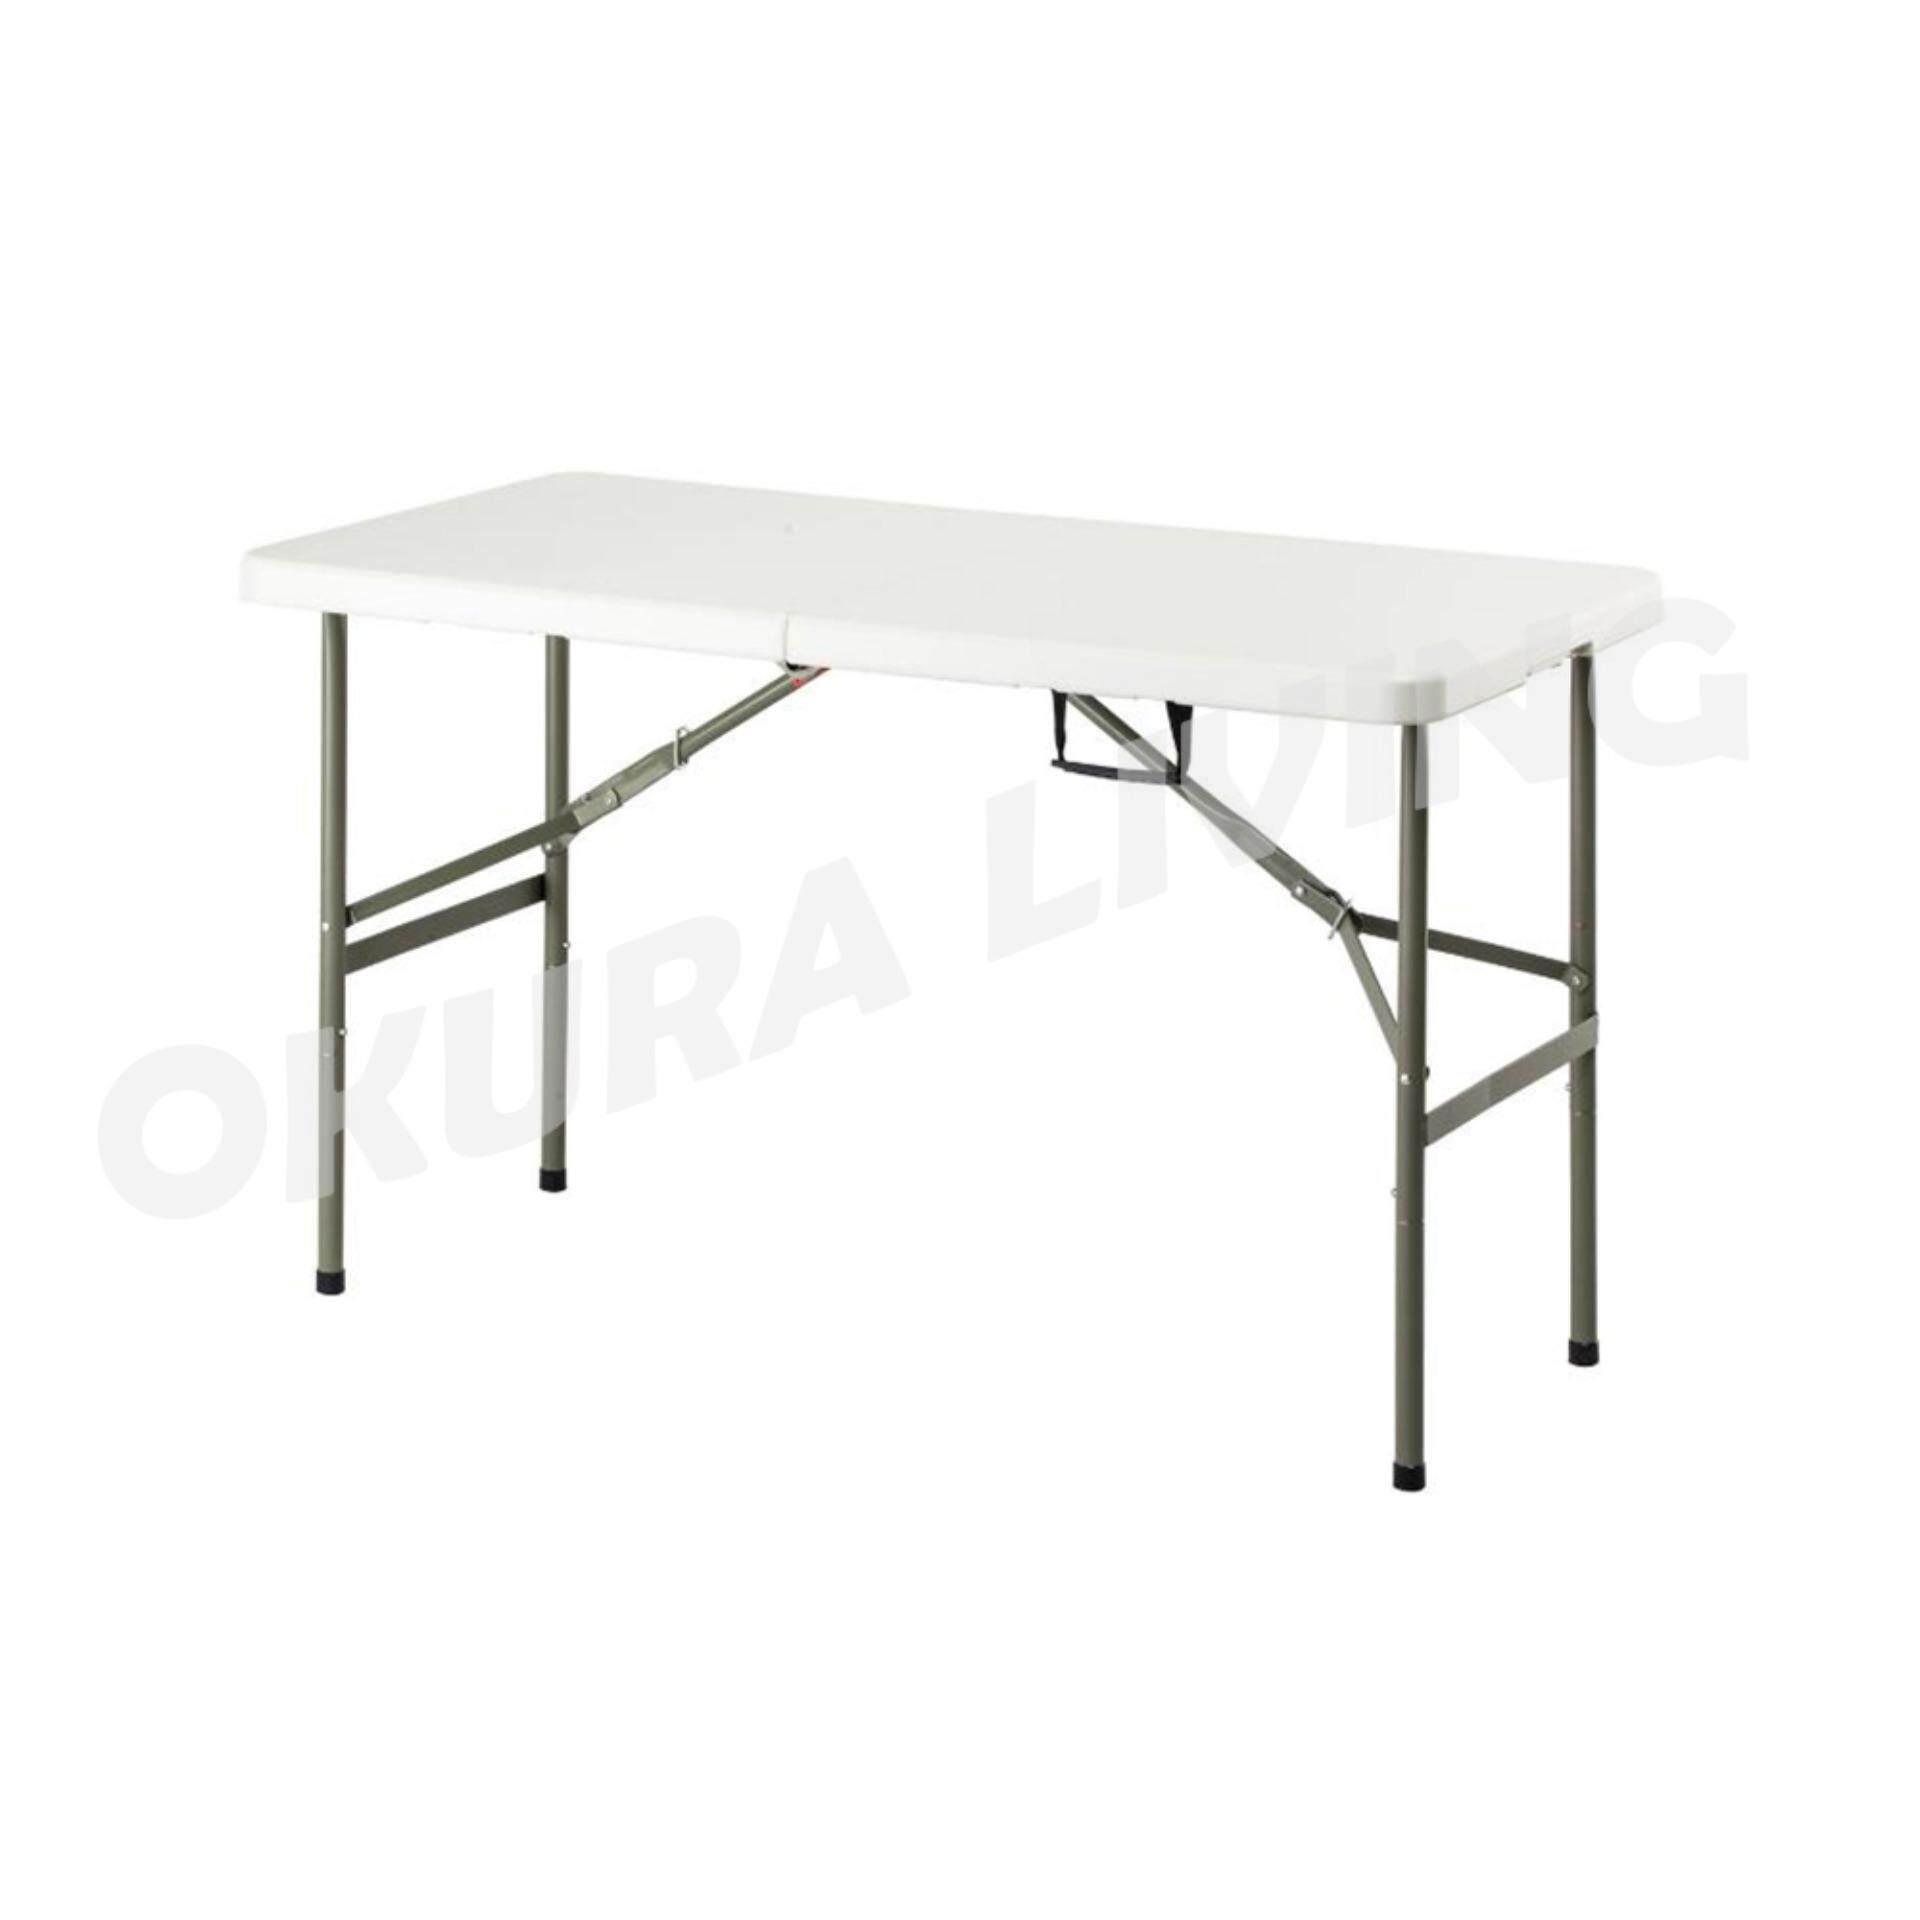 OKURA Foldable Banquet Table Event / Catering / Hall / Buffet Folding Table Meja Lipat Niaga 4' x 2'